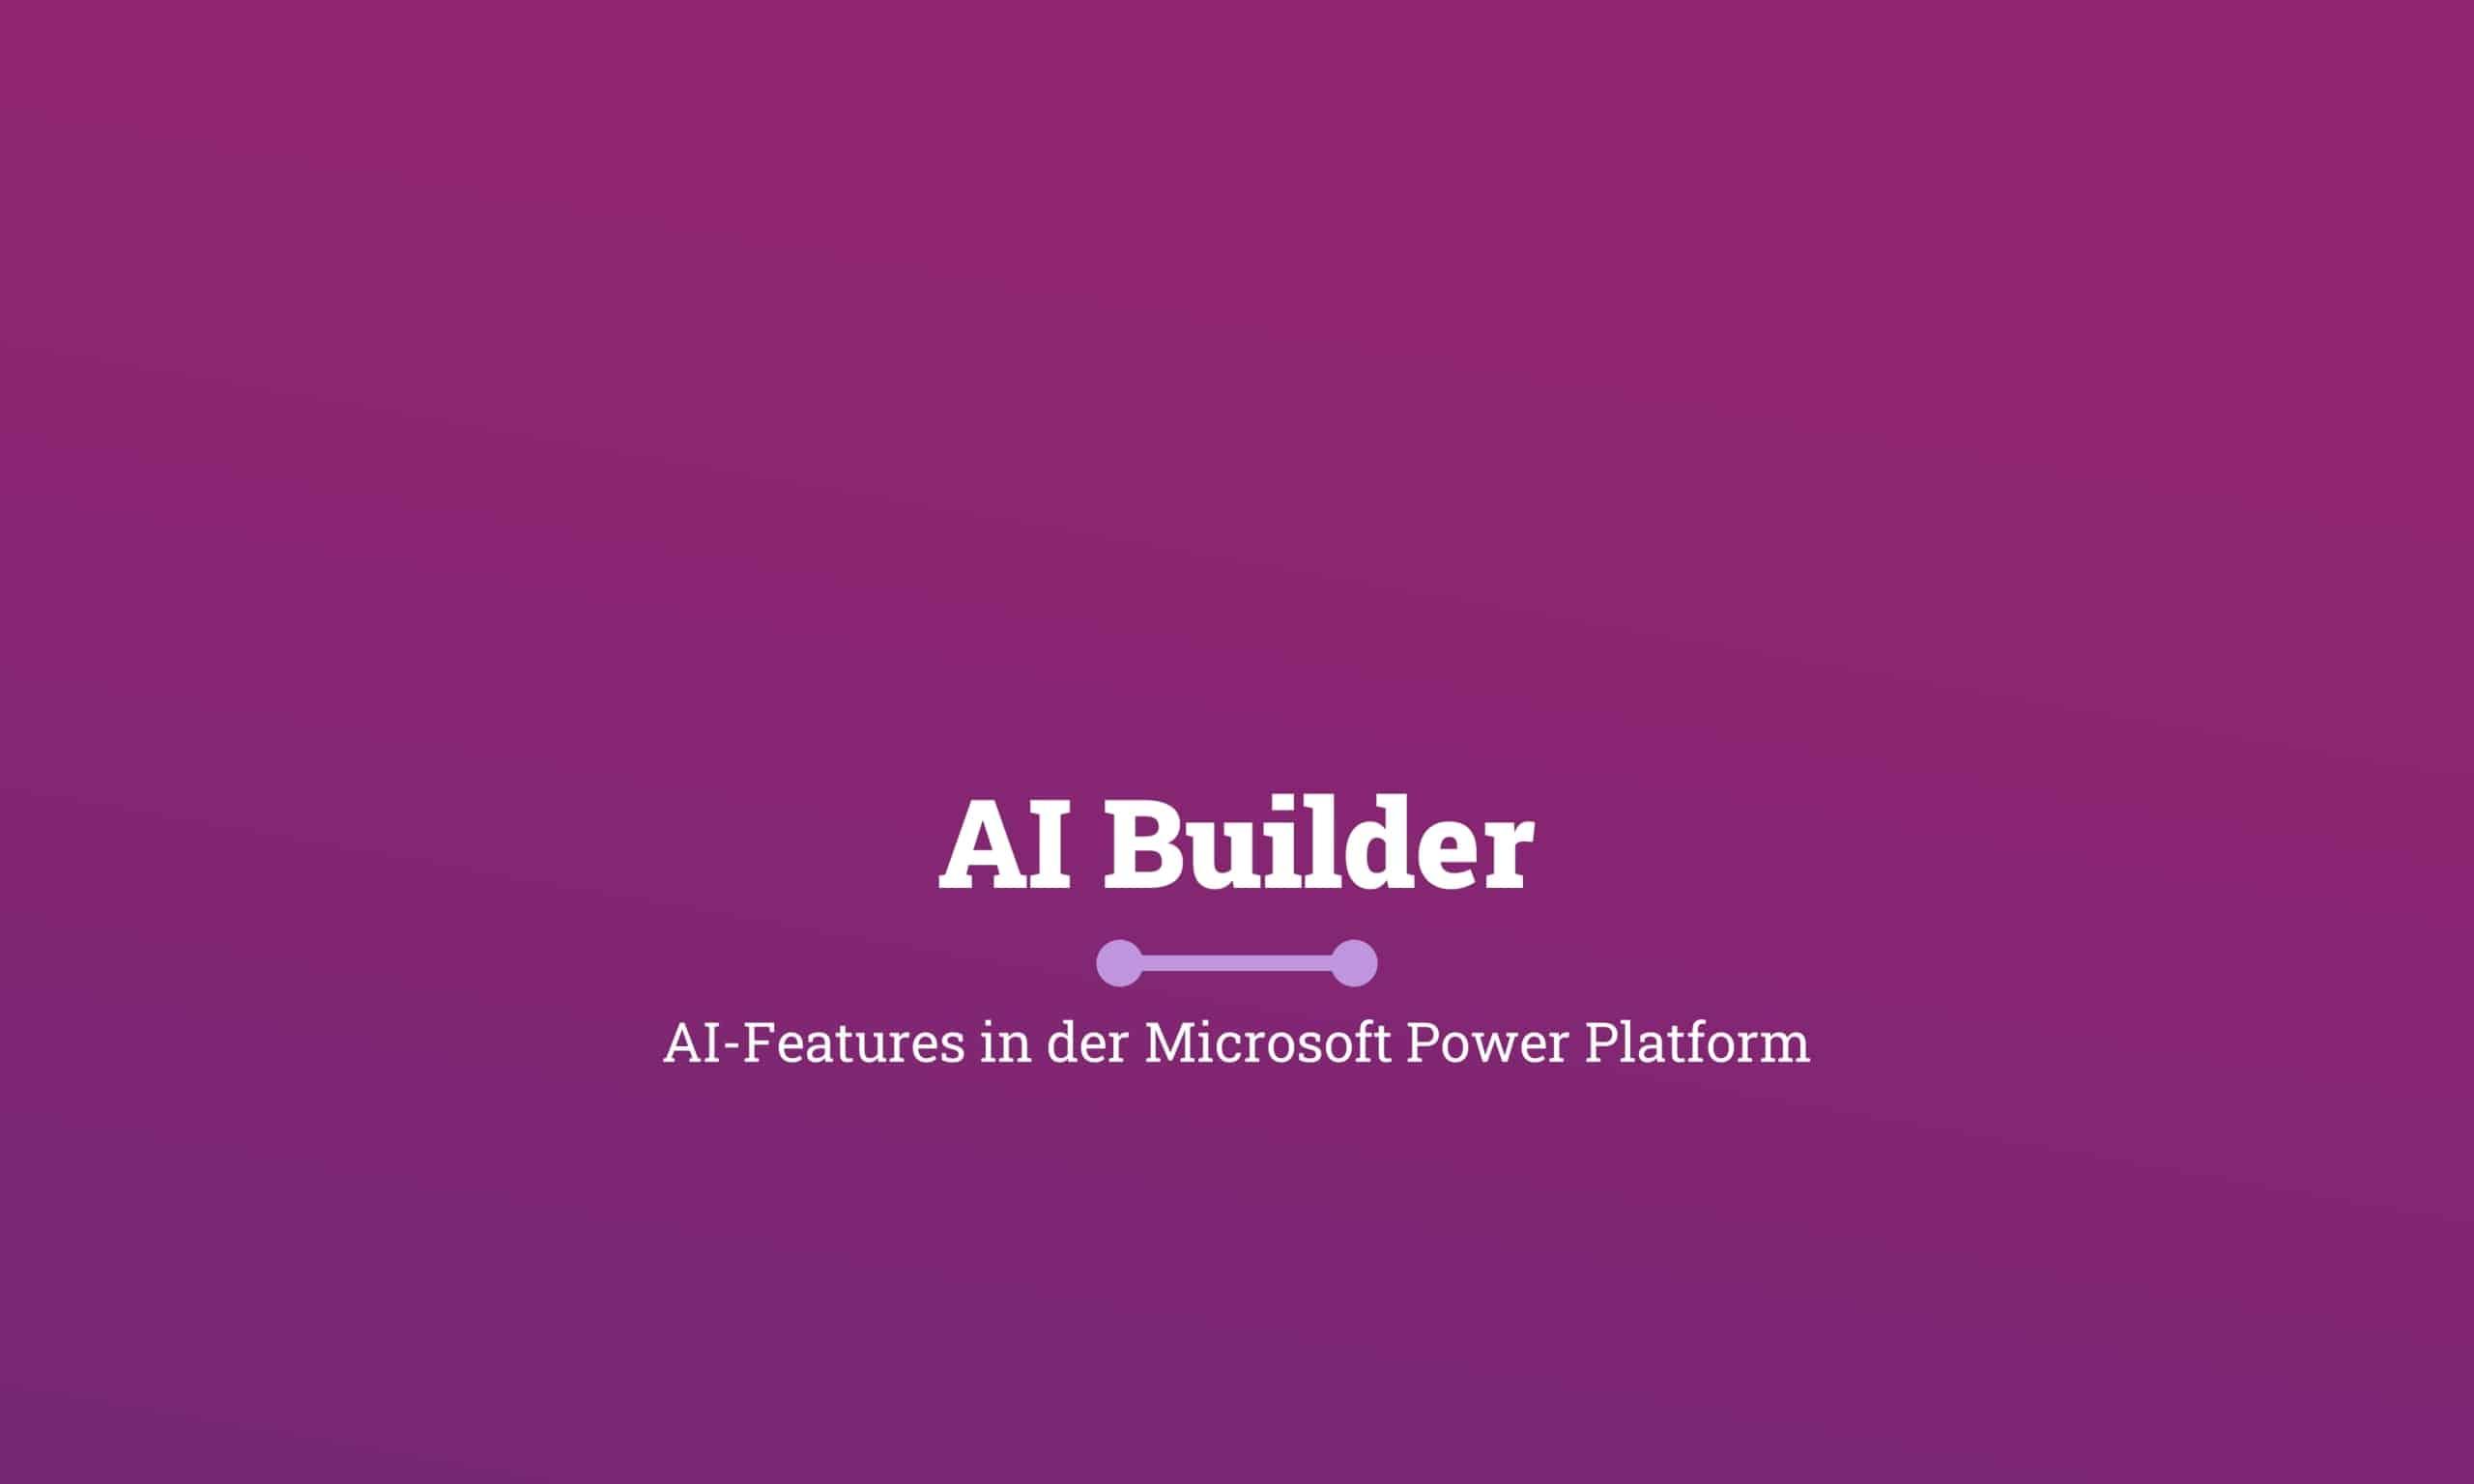 Microsoft Power Platform AI Builder Titelbild scaled